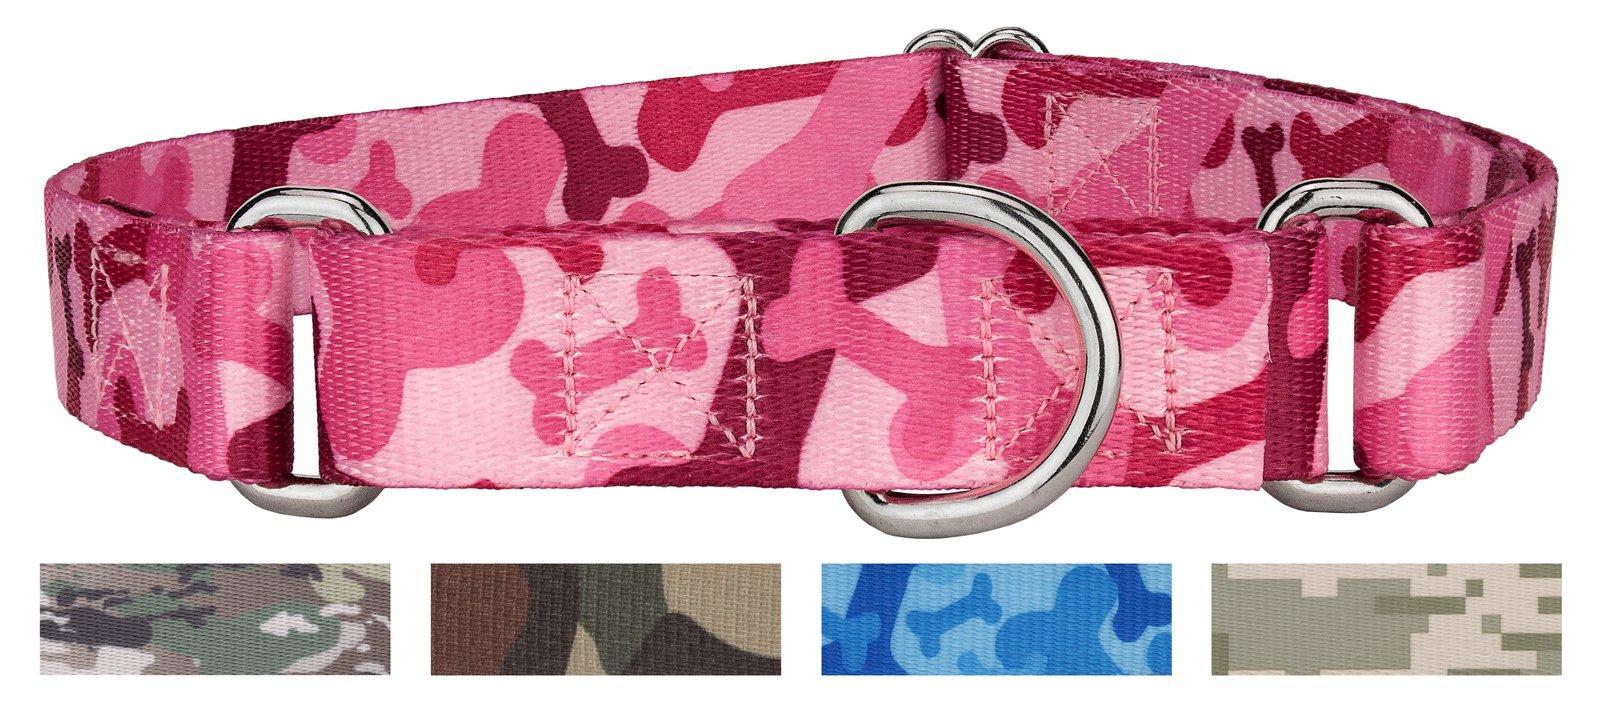 10 - Country Brook Design Pink Bone Camo Martingale Dog Collars - Extra Small